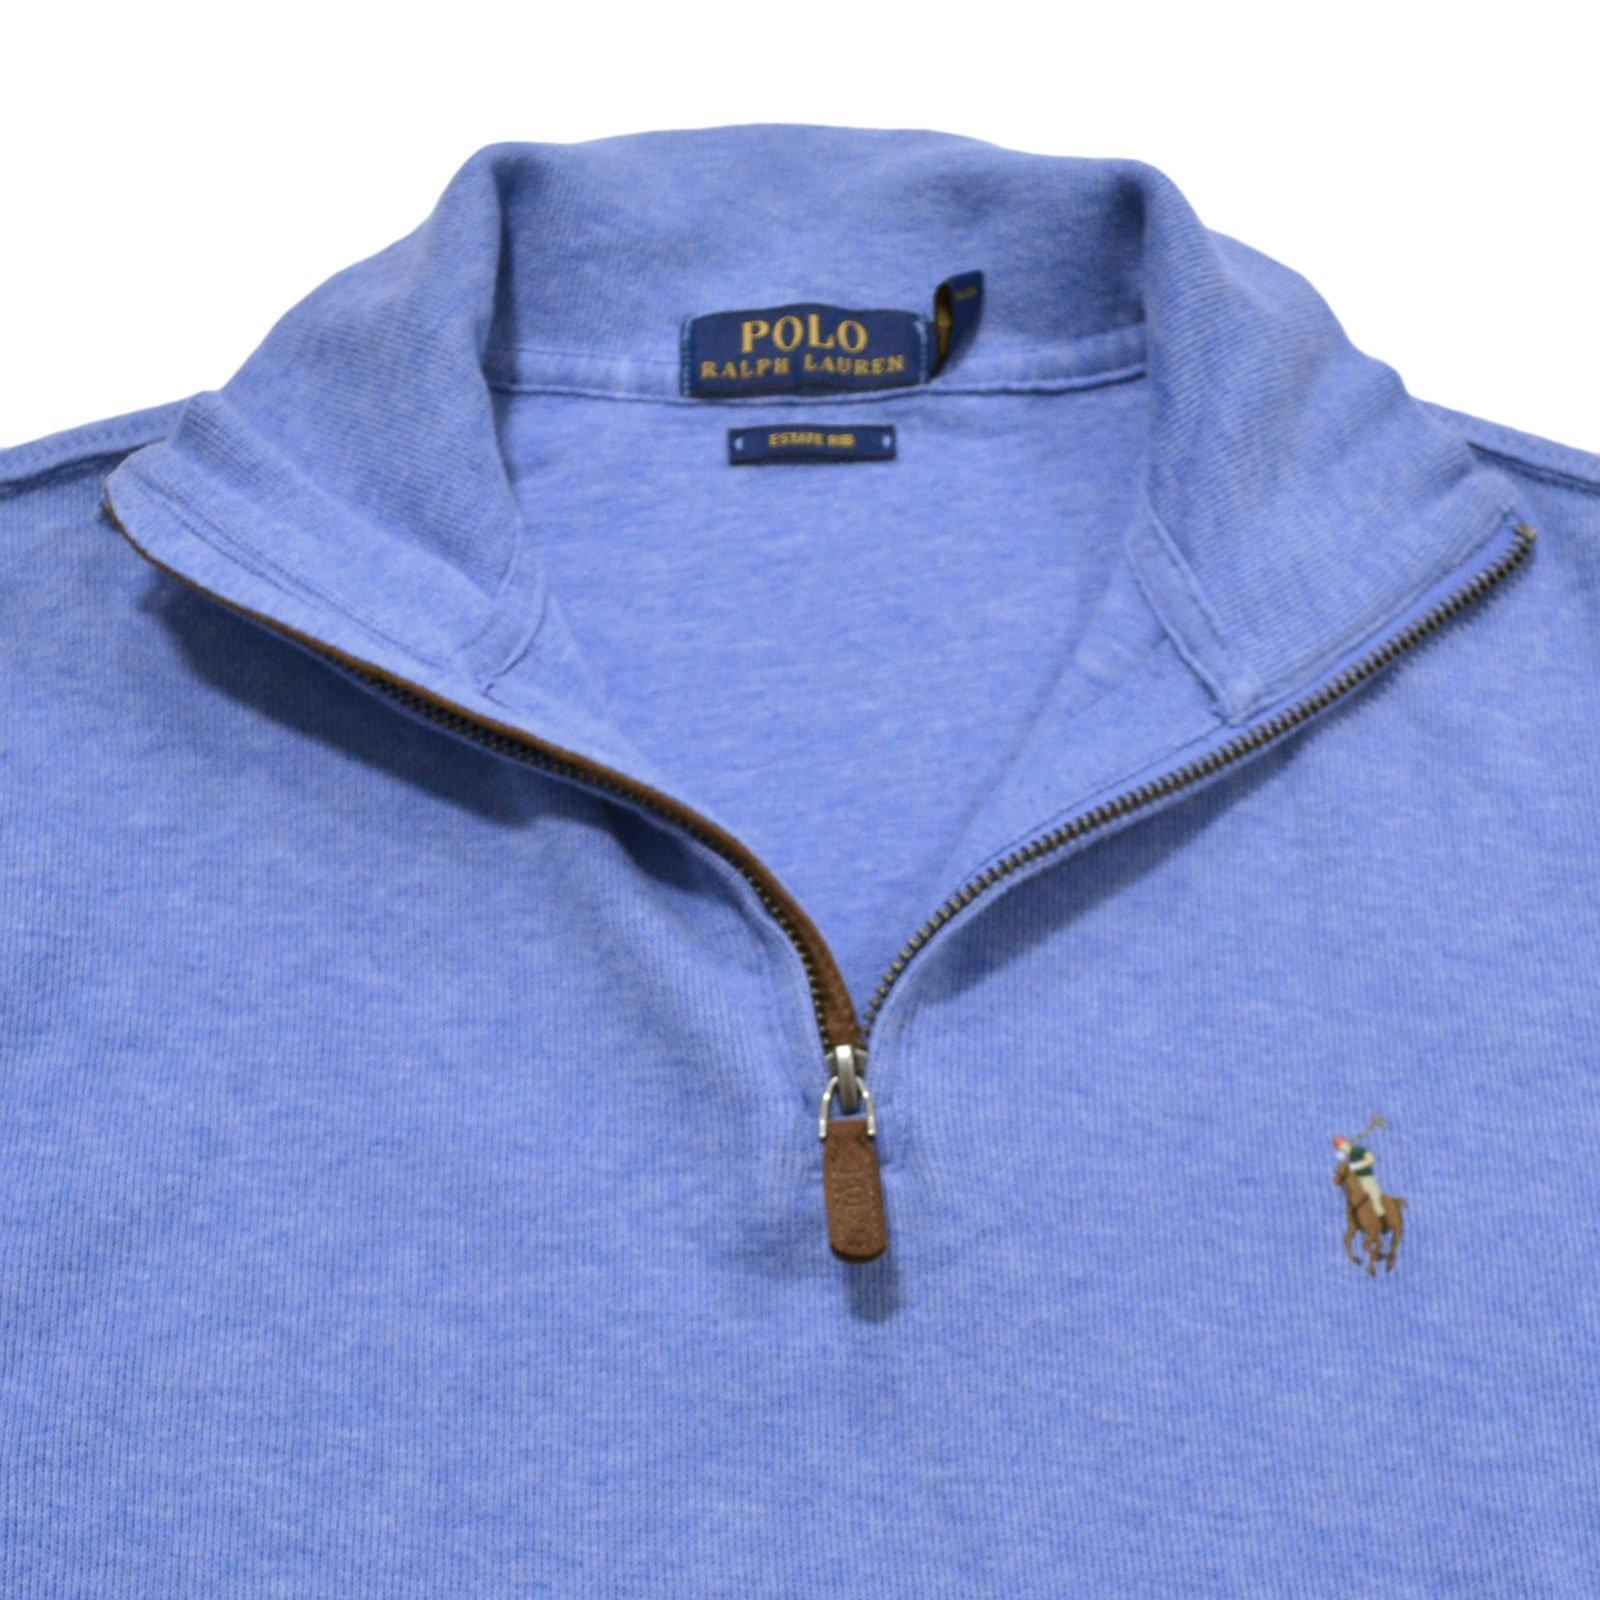 Polo Ralph Lauren Men's Estate Rib Half Zip Sweater, XL, Welsh Blue by Polo Ralph Lauren (Image #2)